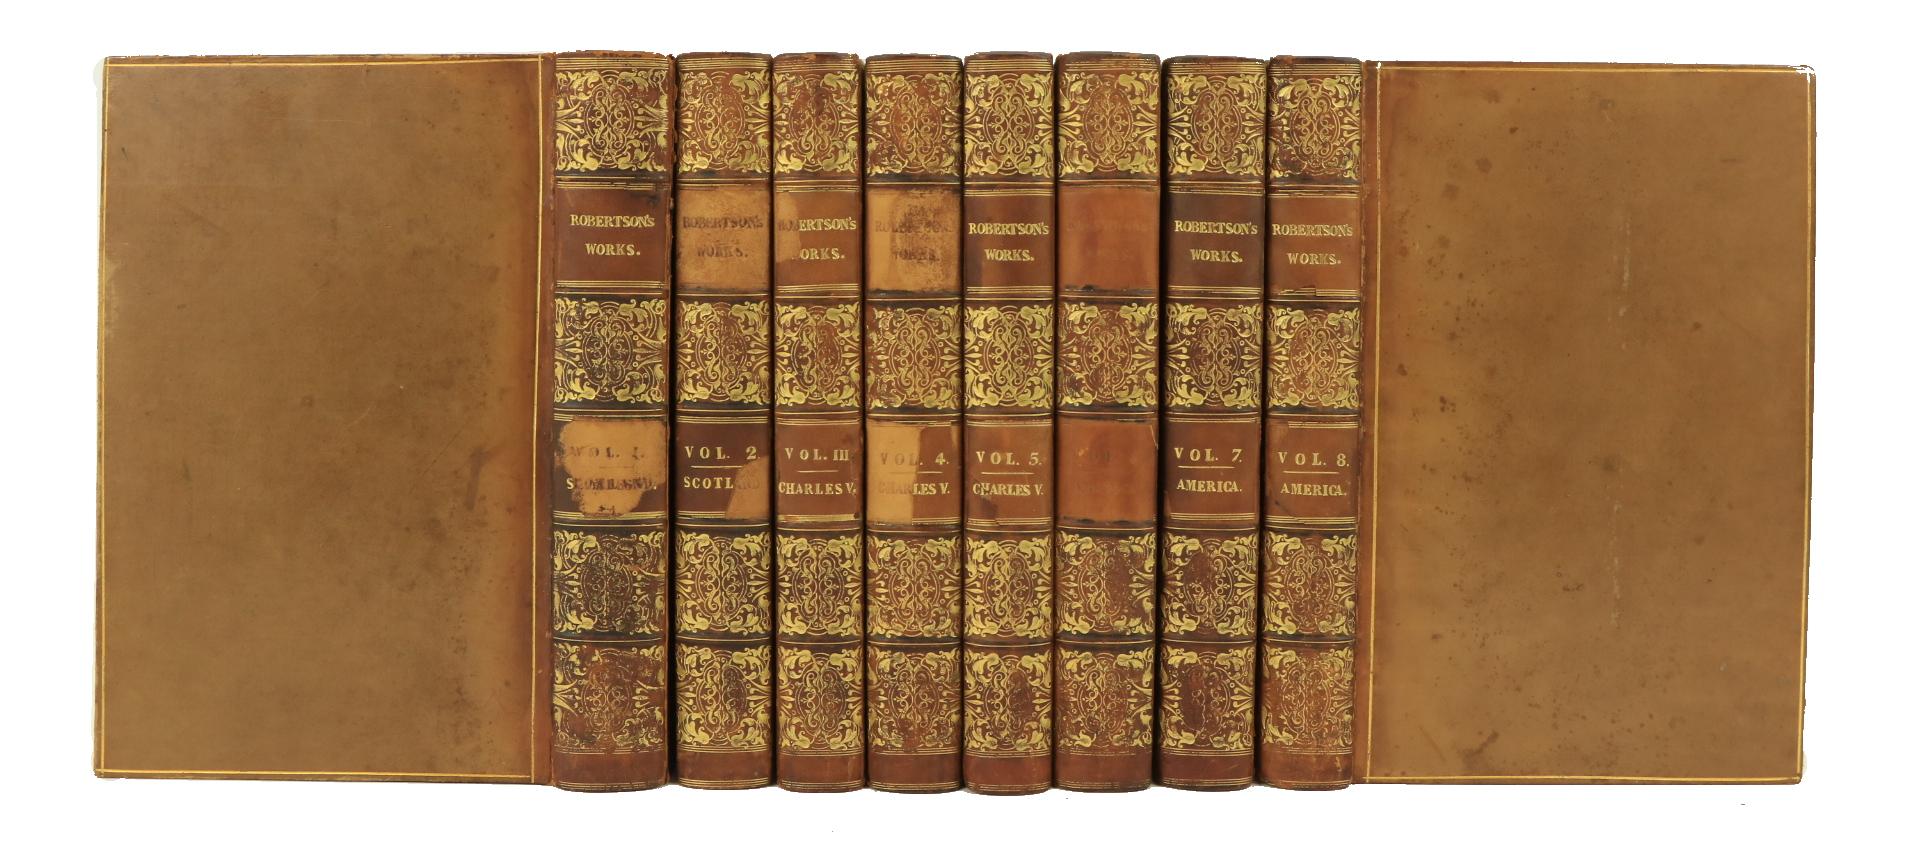 Bindings:ÿ Scott (Sir W.)ÿWaverley Novels, 48 vols. 12mo Edinburgh 1830, Engd. add. titles,